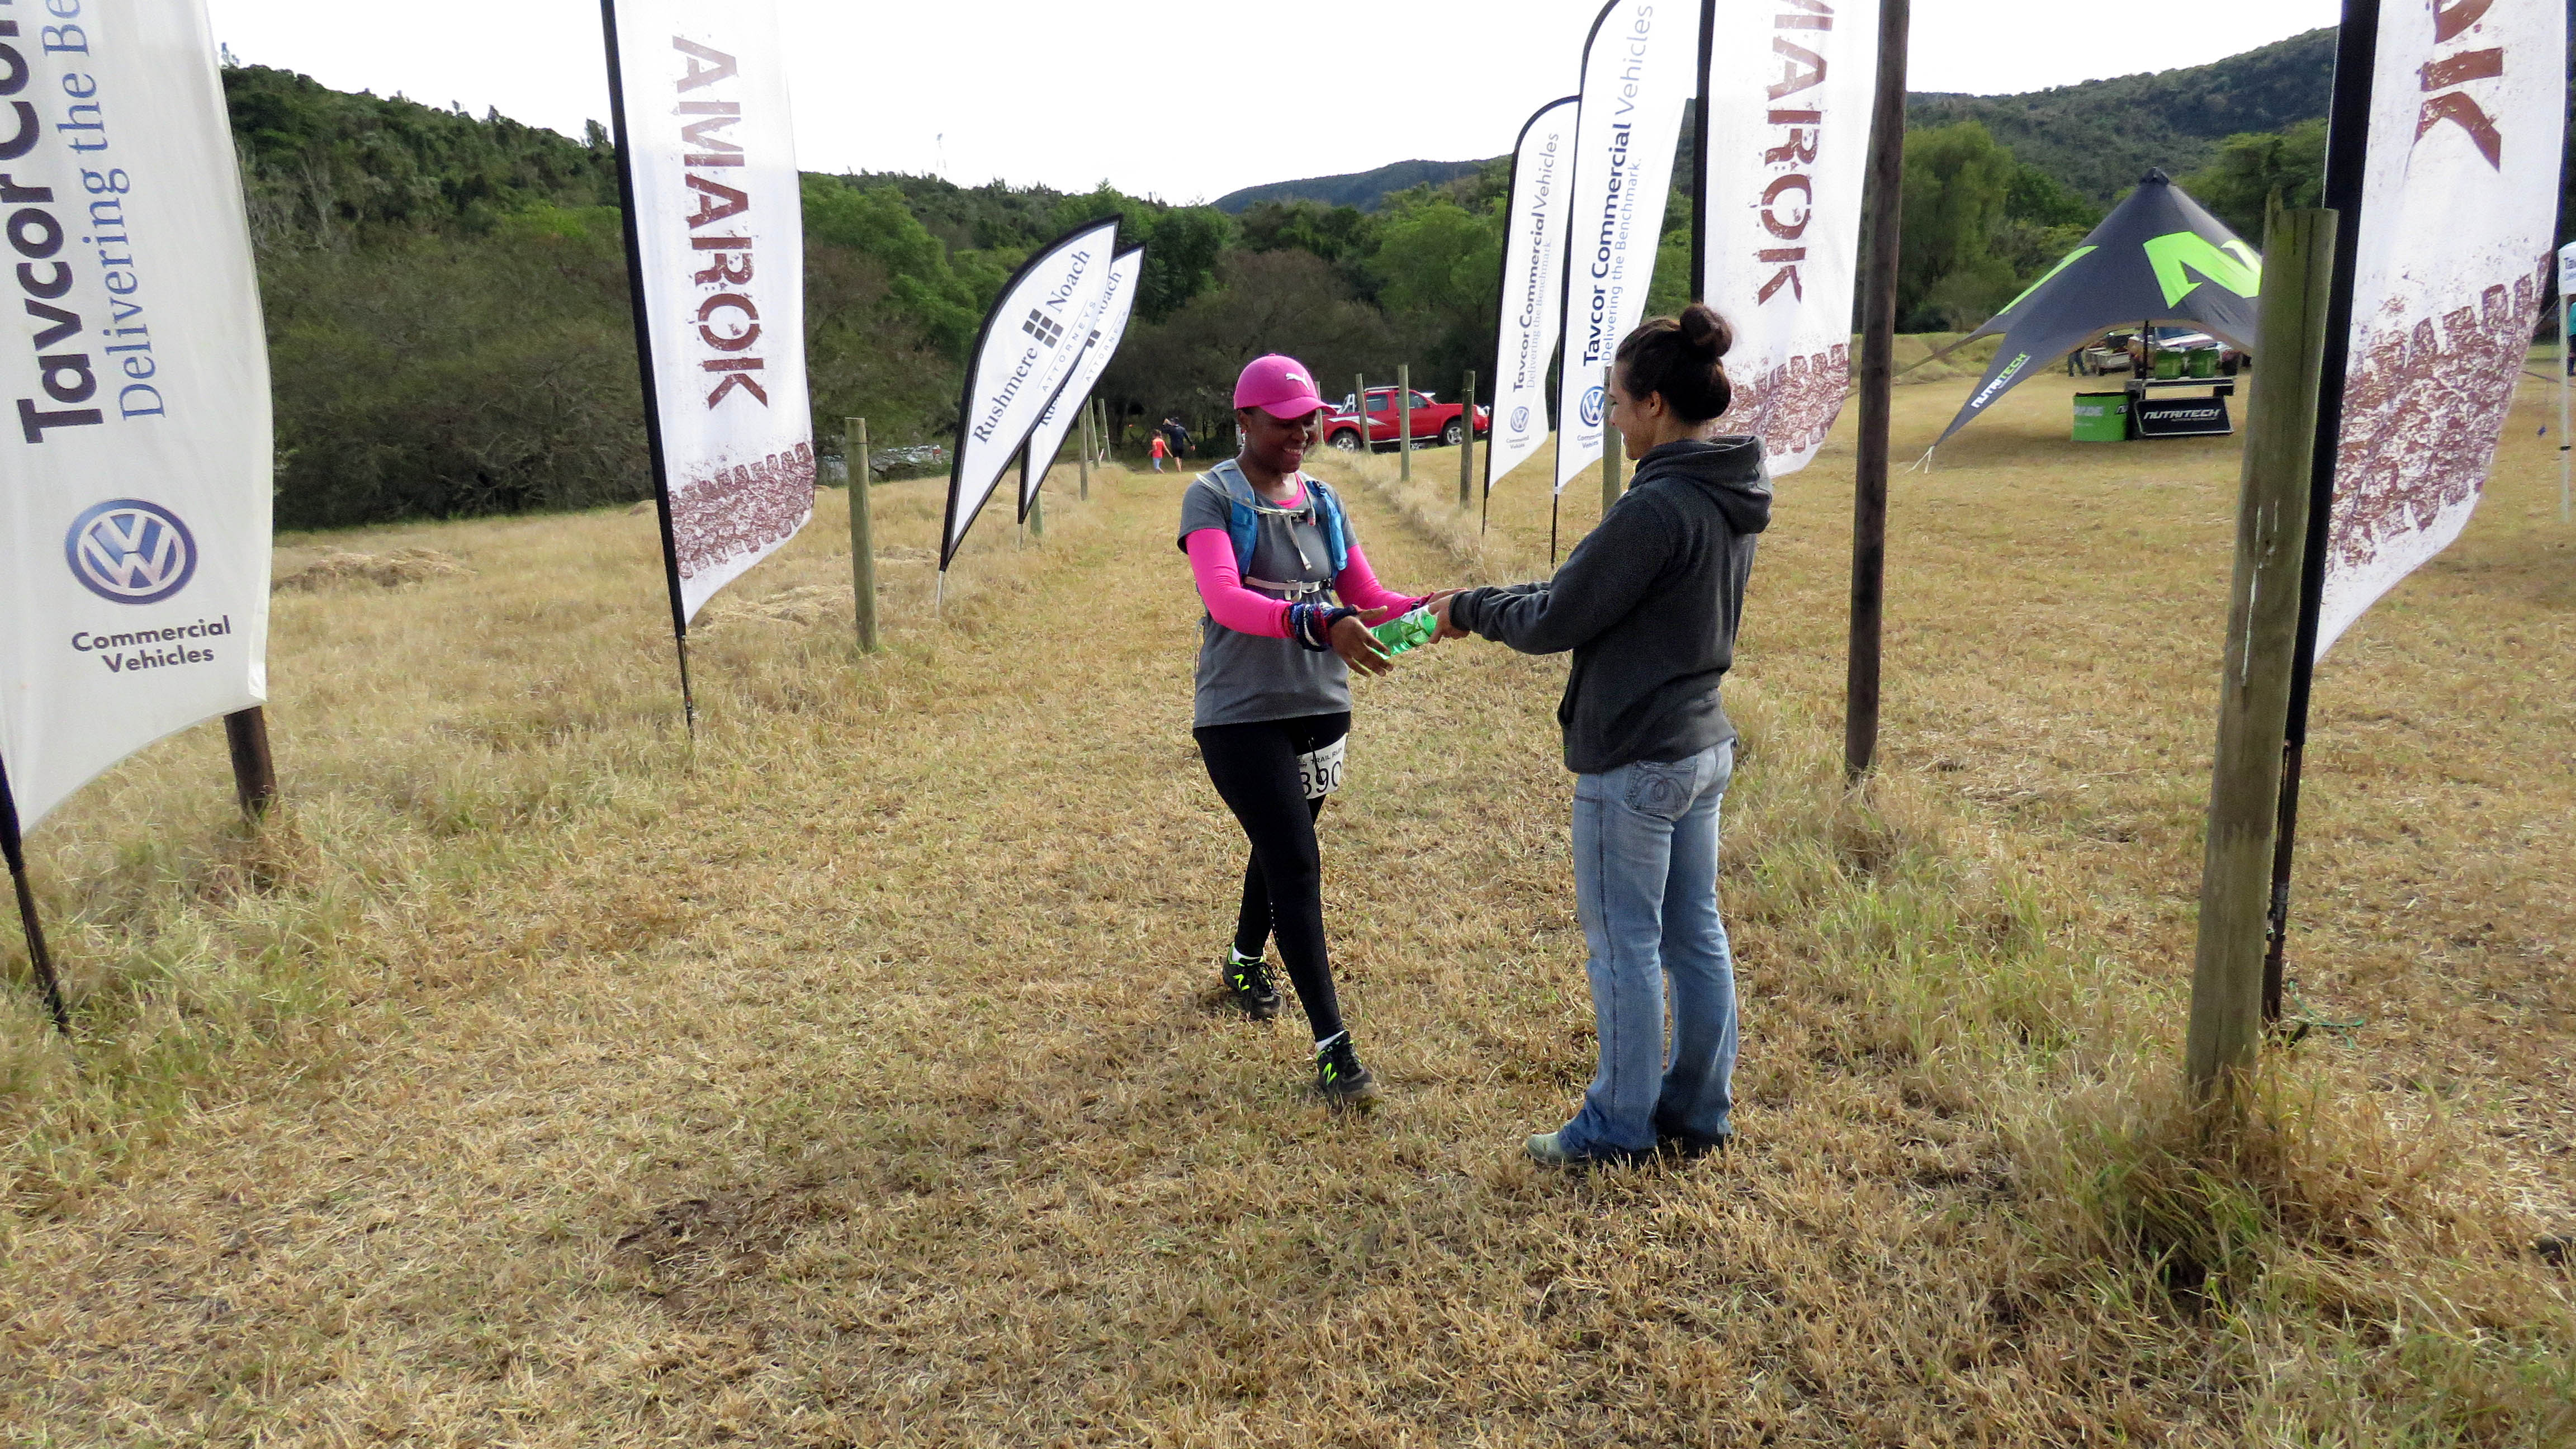 hayterdale trailrun 2018-08-05  (133)